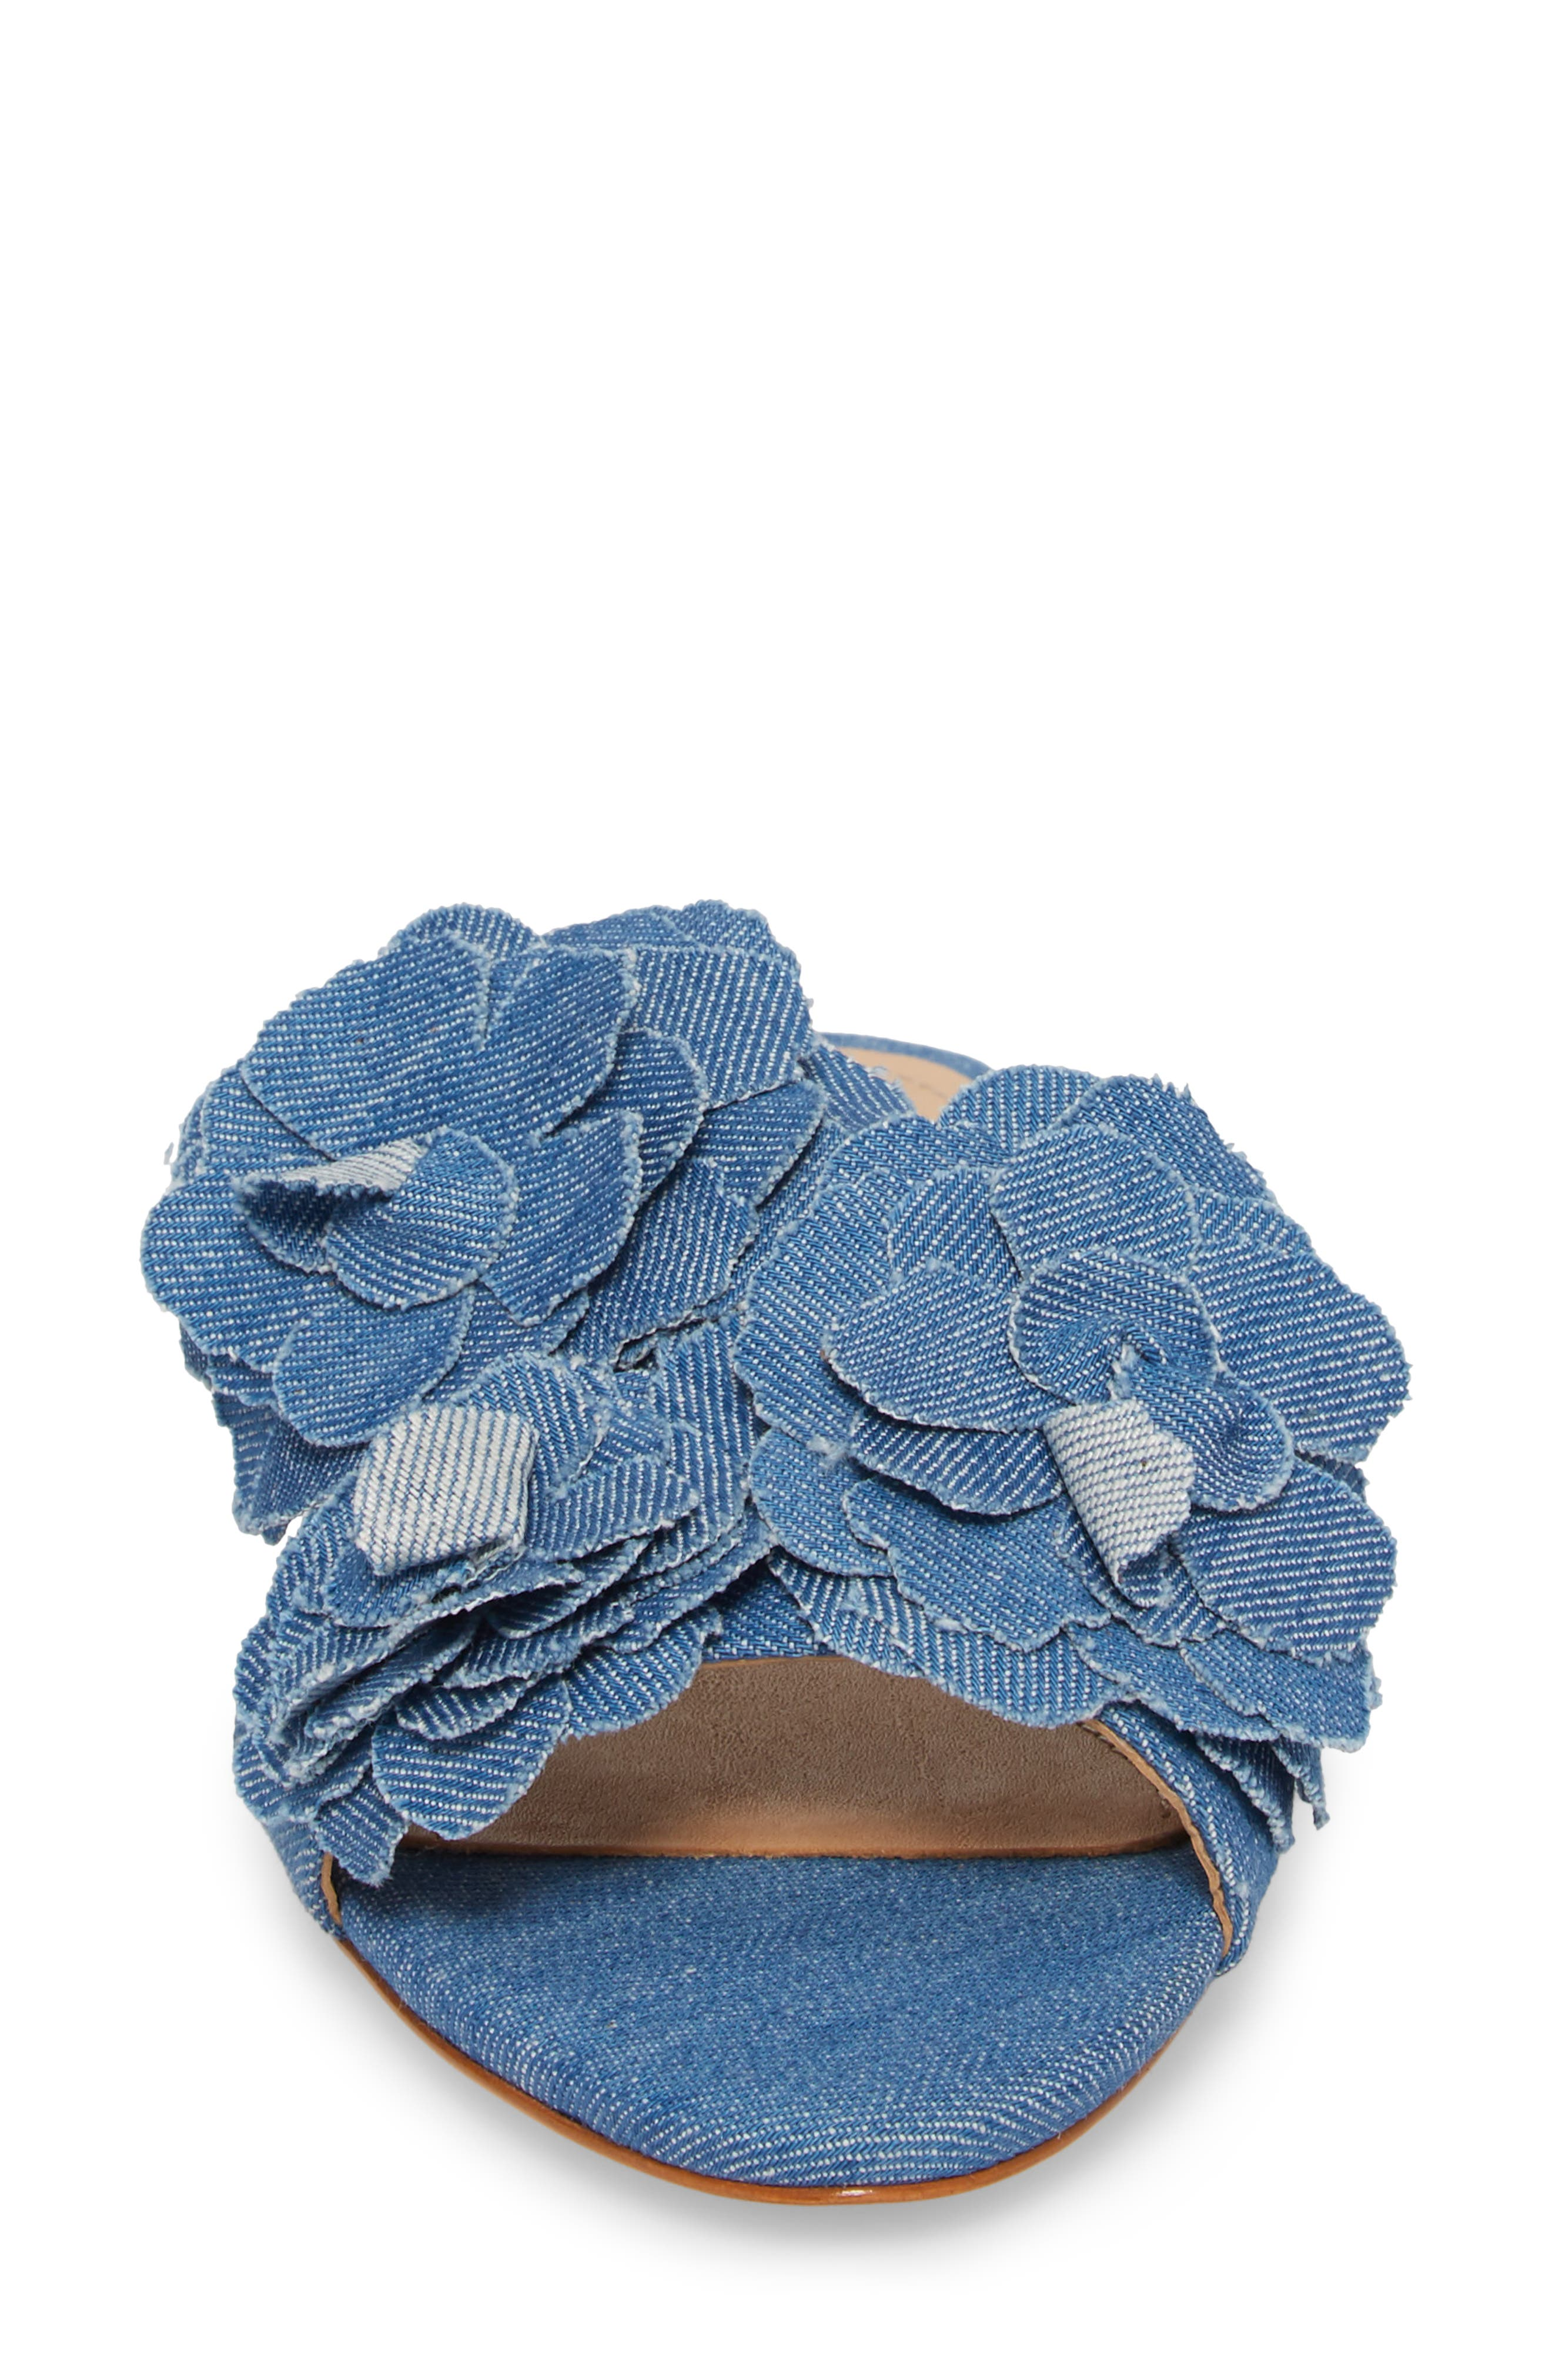 Ilaria Flower Sandal,                             Alternate thumbnail 4, color,                             LIGHT BLUE